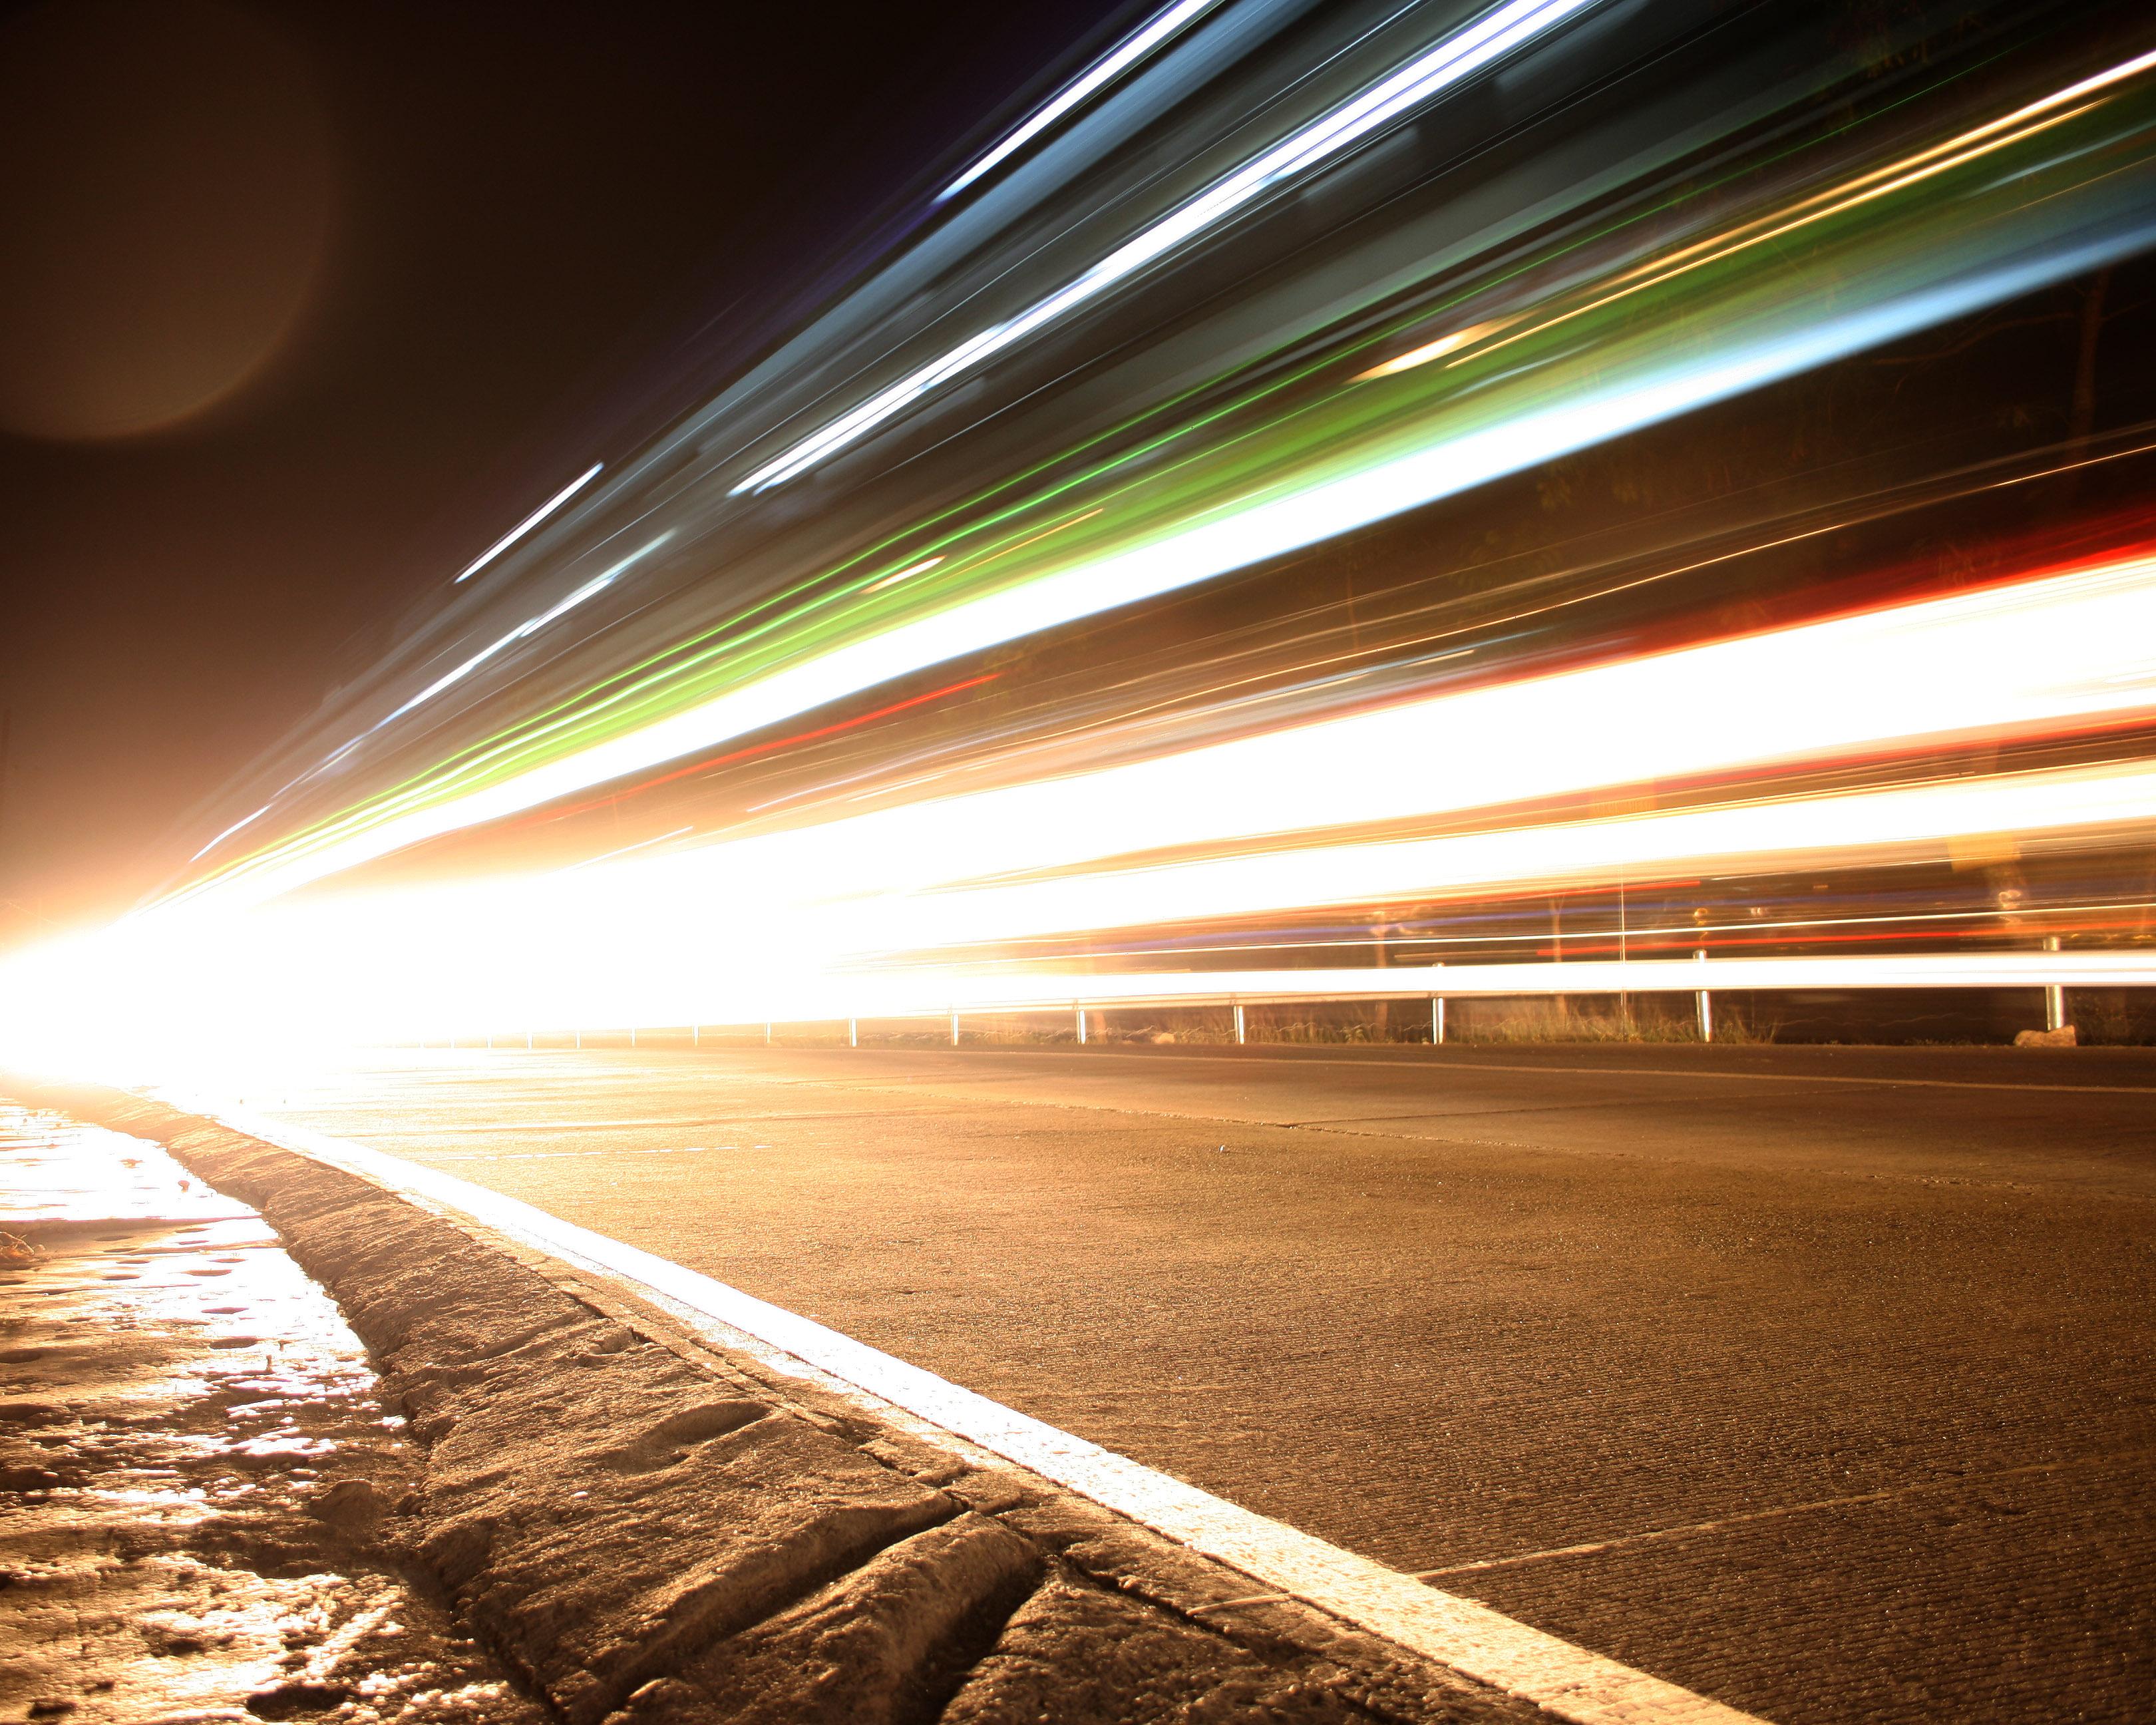 broadband_speed_lights-CompresstionTest